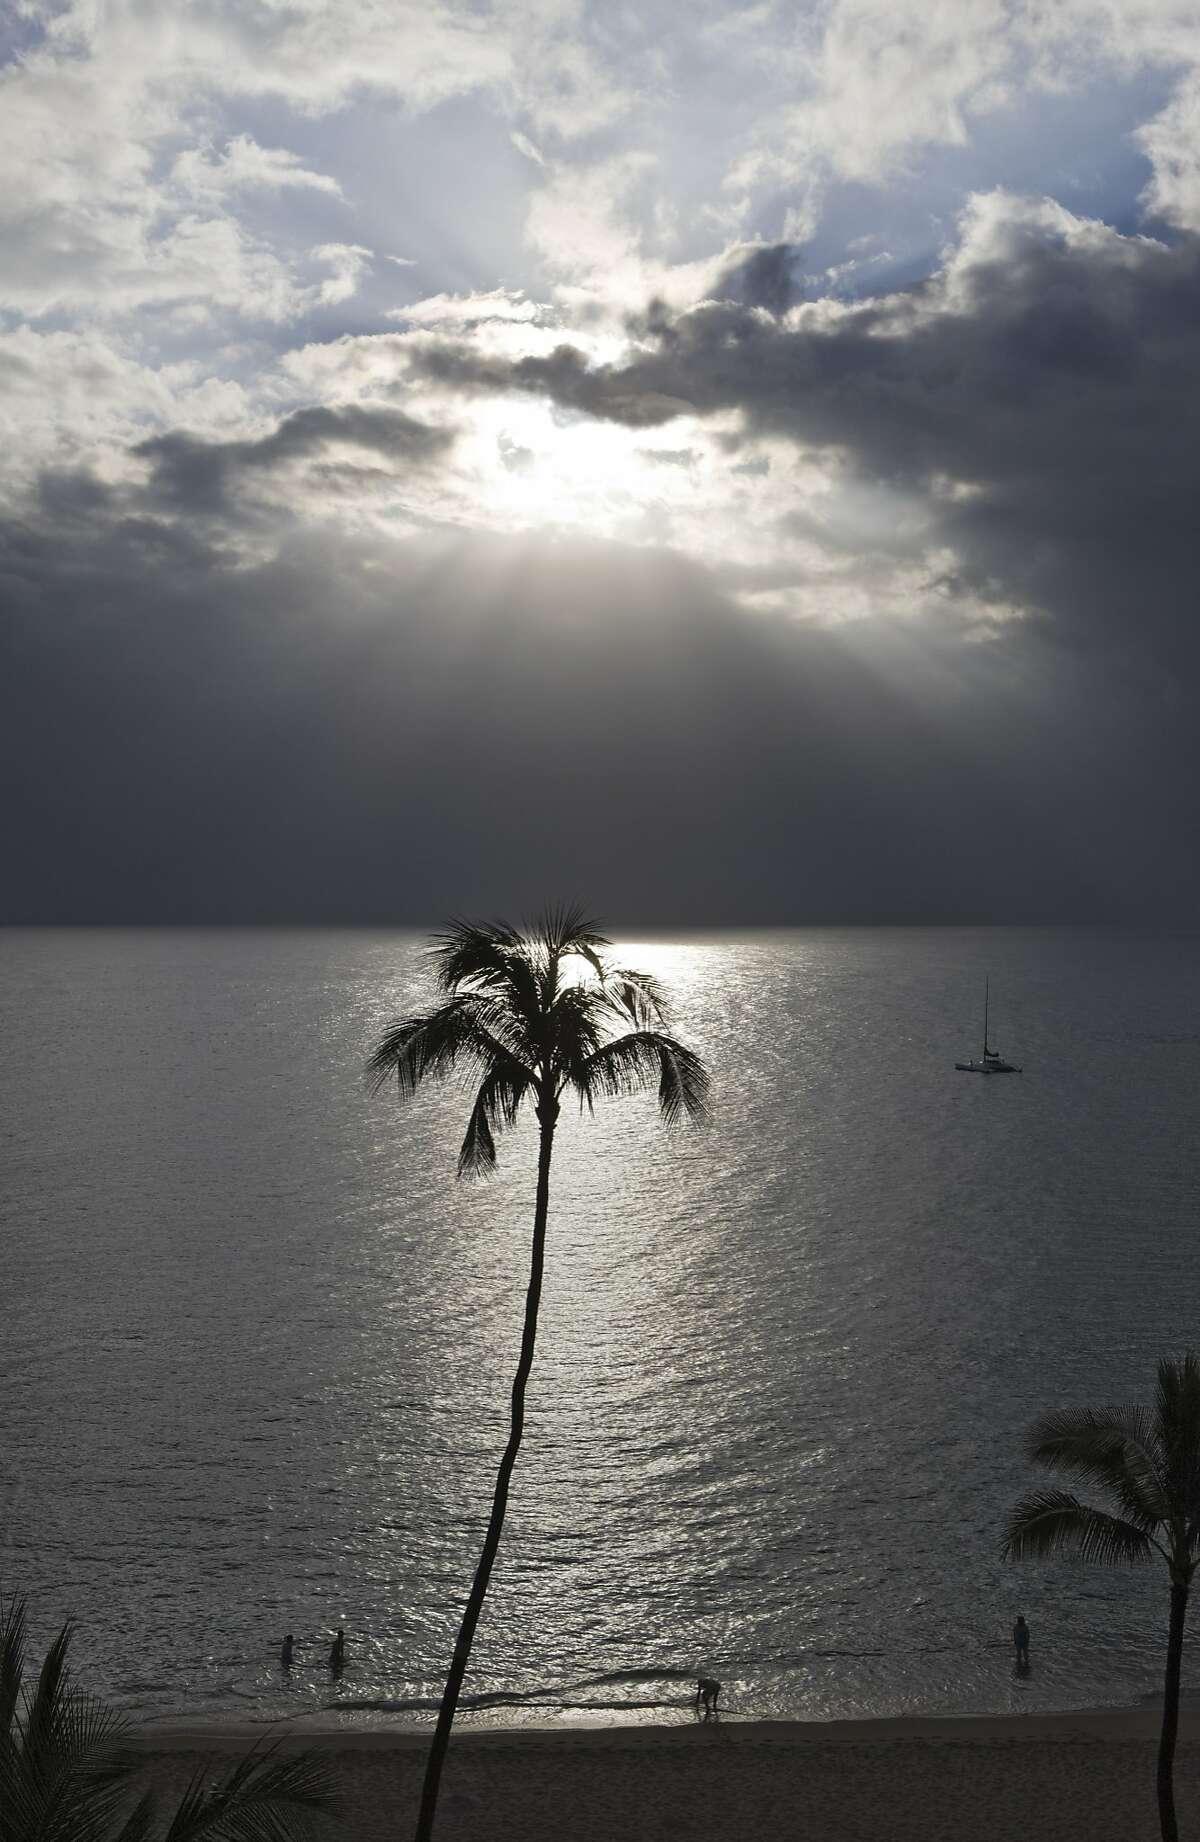 Coconut Palm with Backlight, Maui, Hawaii, USA (Photo by Reinhard Dirscherl/ullstein bild via Getty Images)